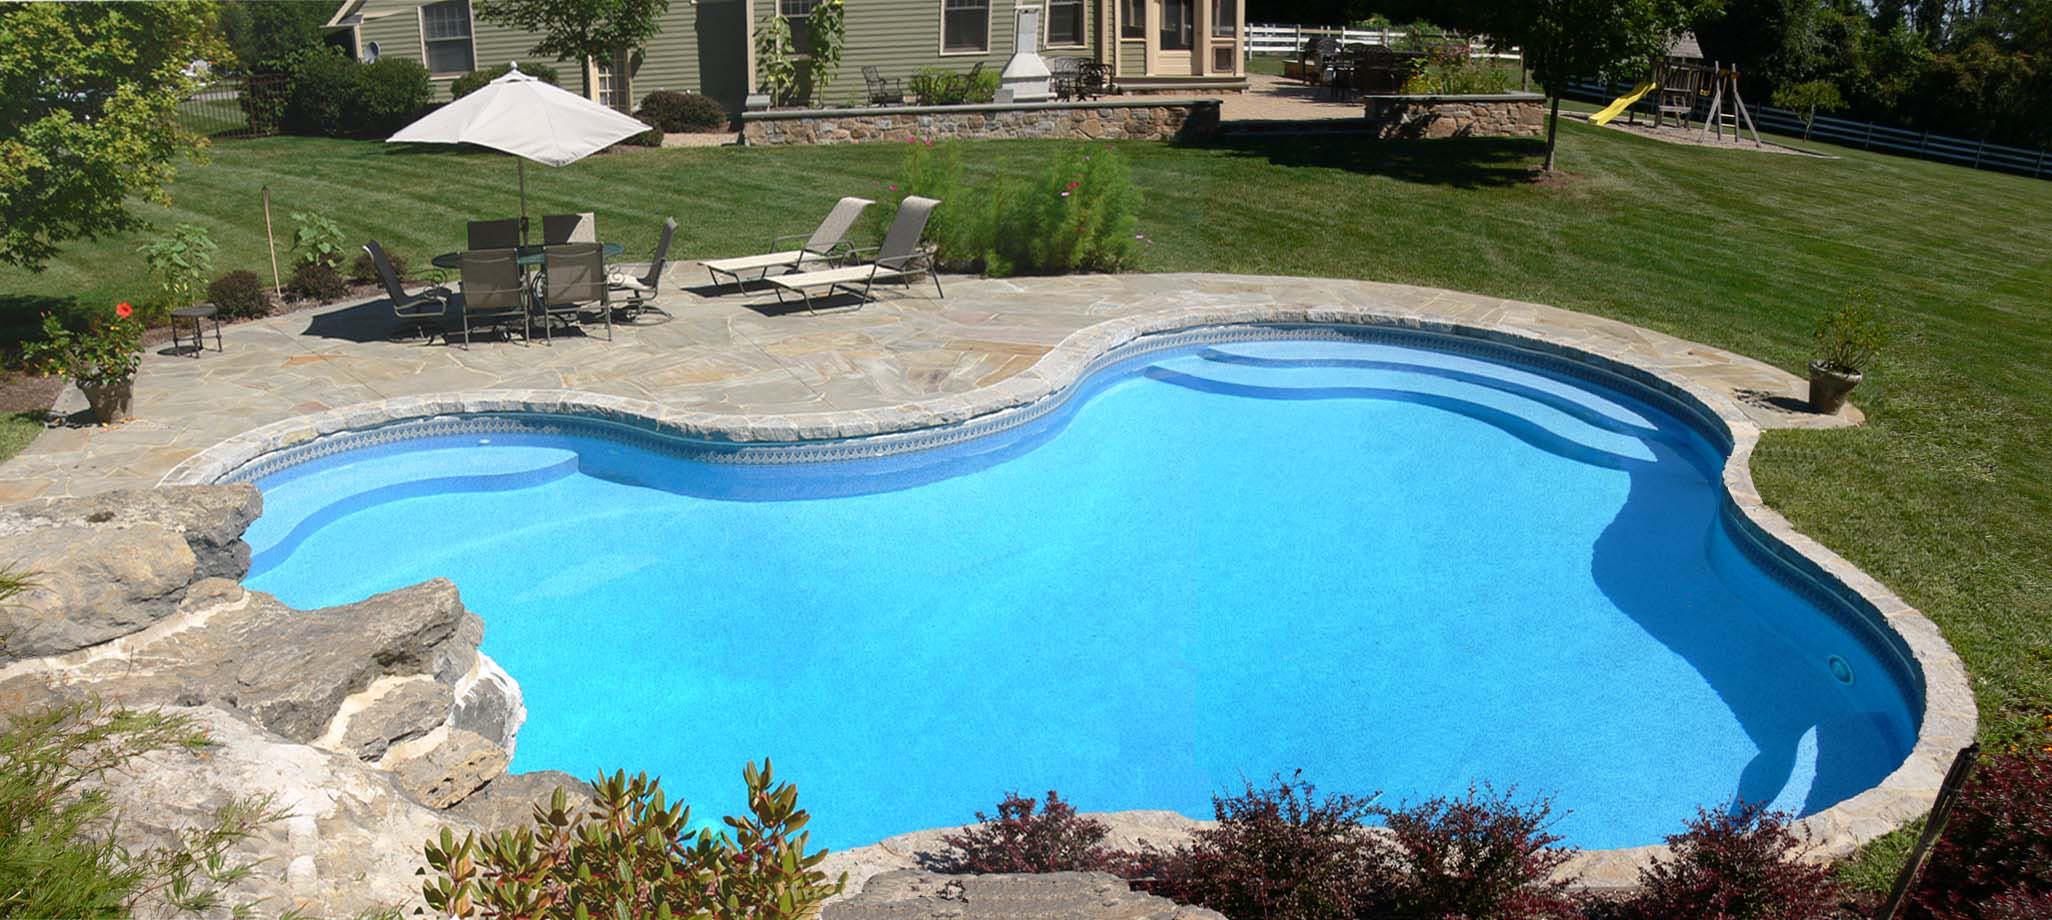 New Pools Freeform2.jpg